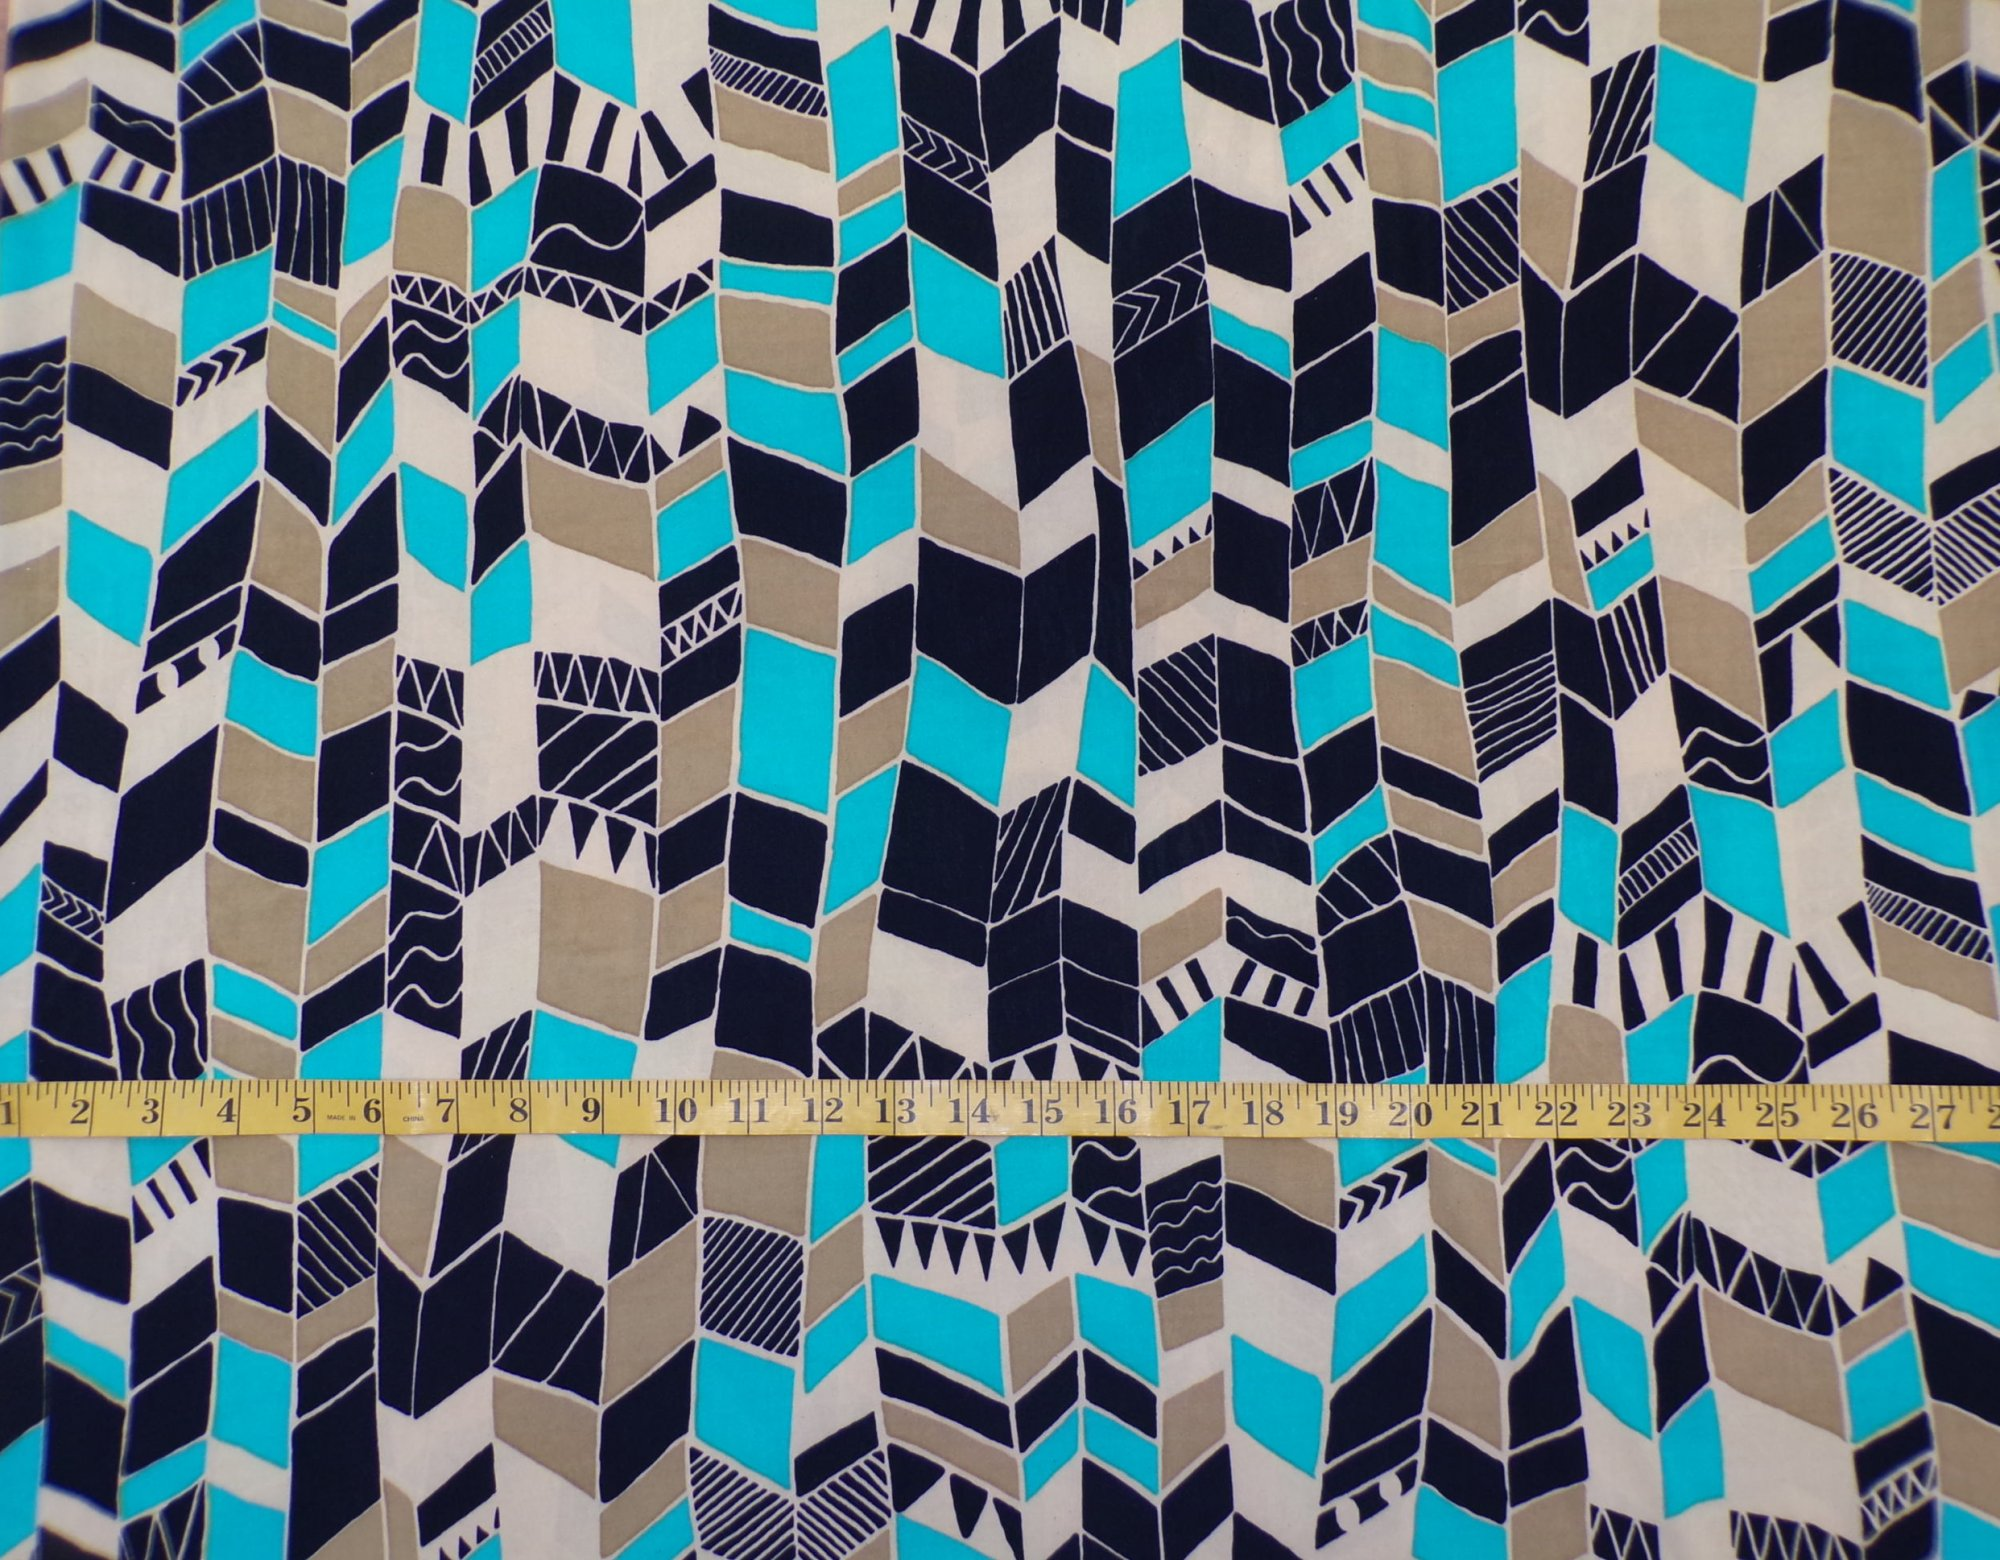 ITY Jersey - Teal Tan and Black Geometric Stripe